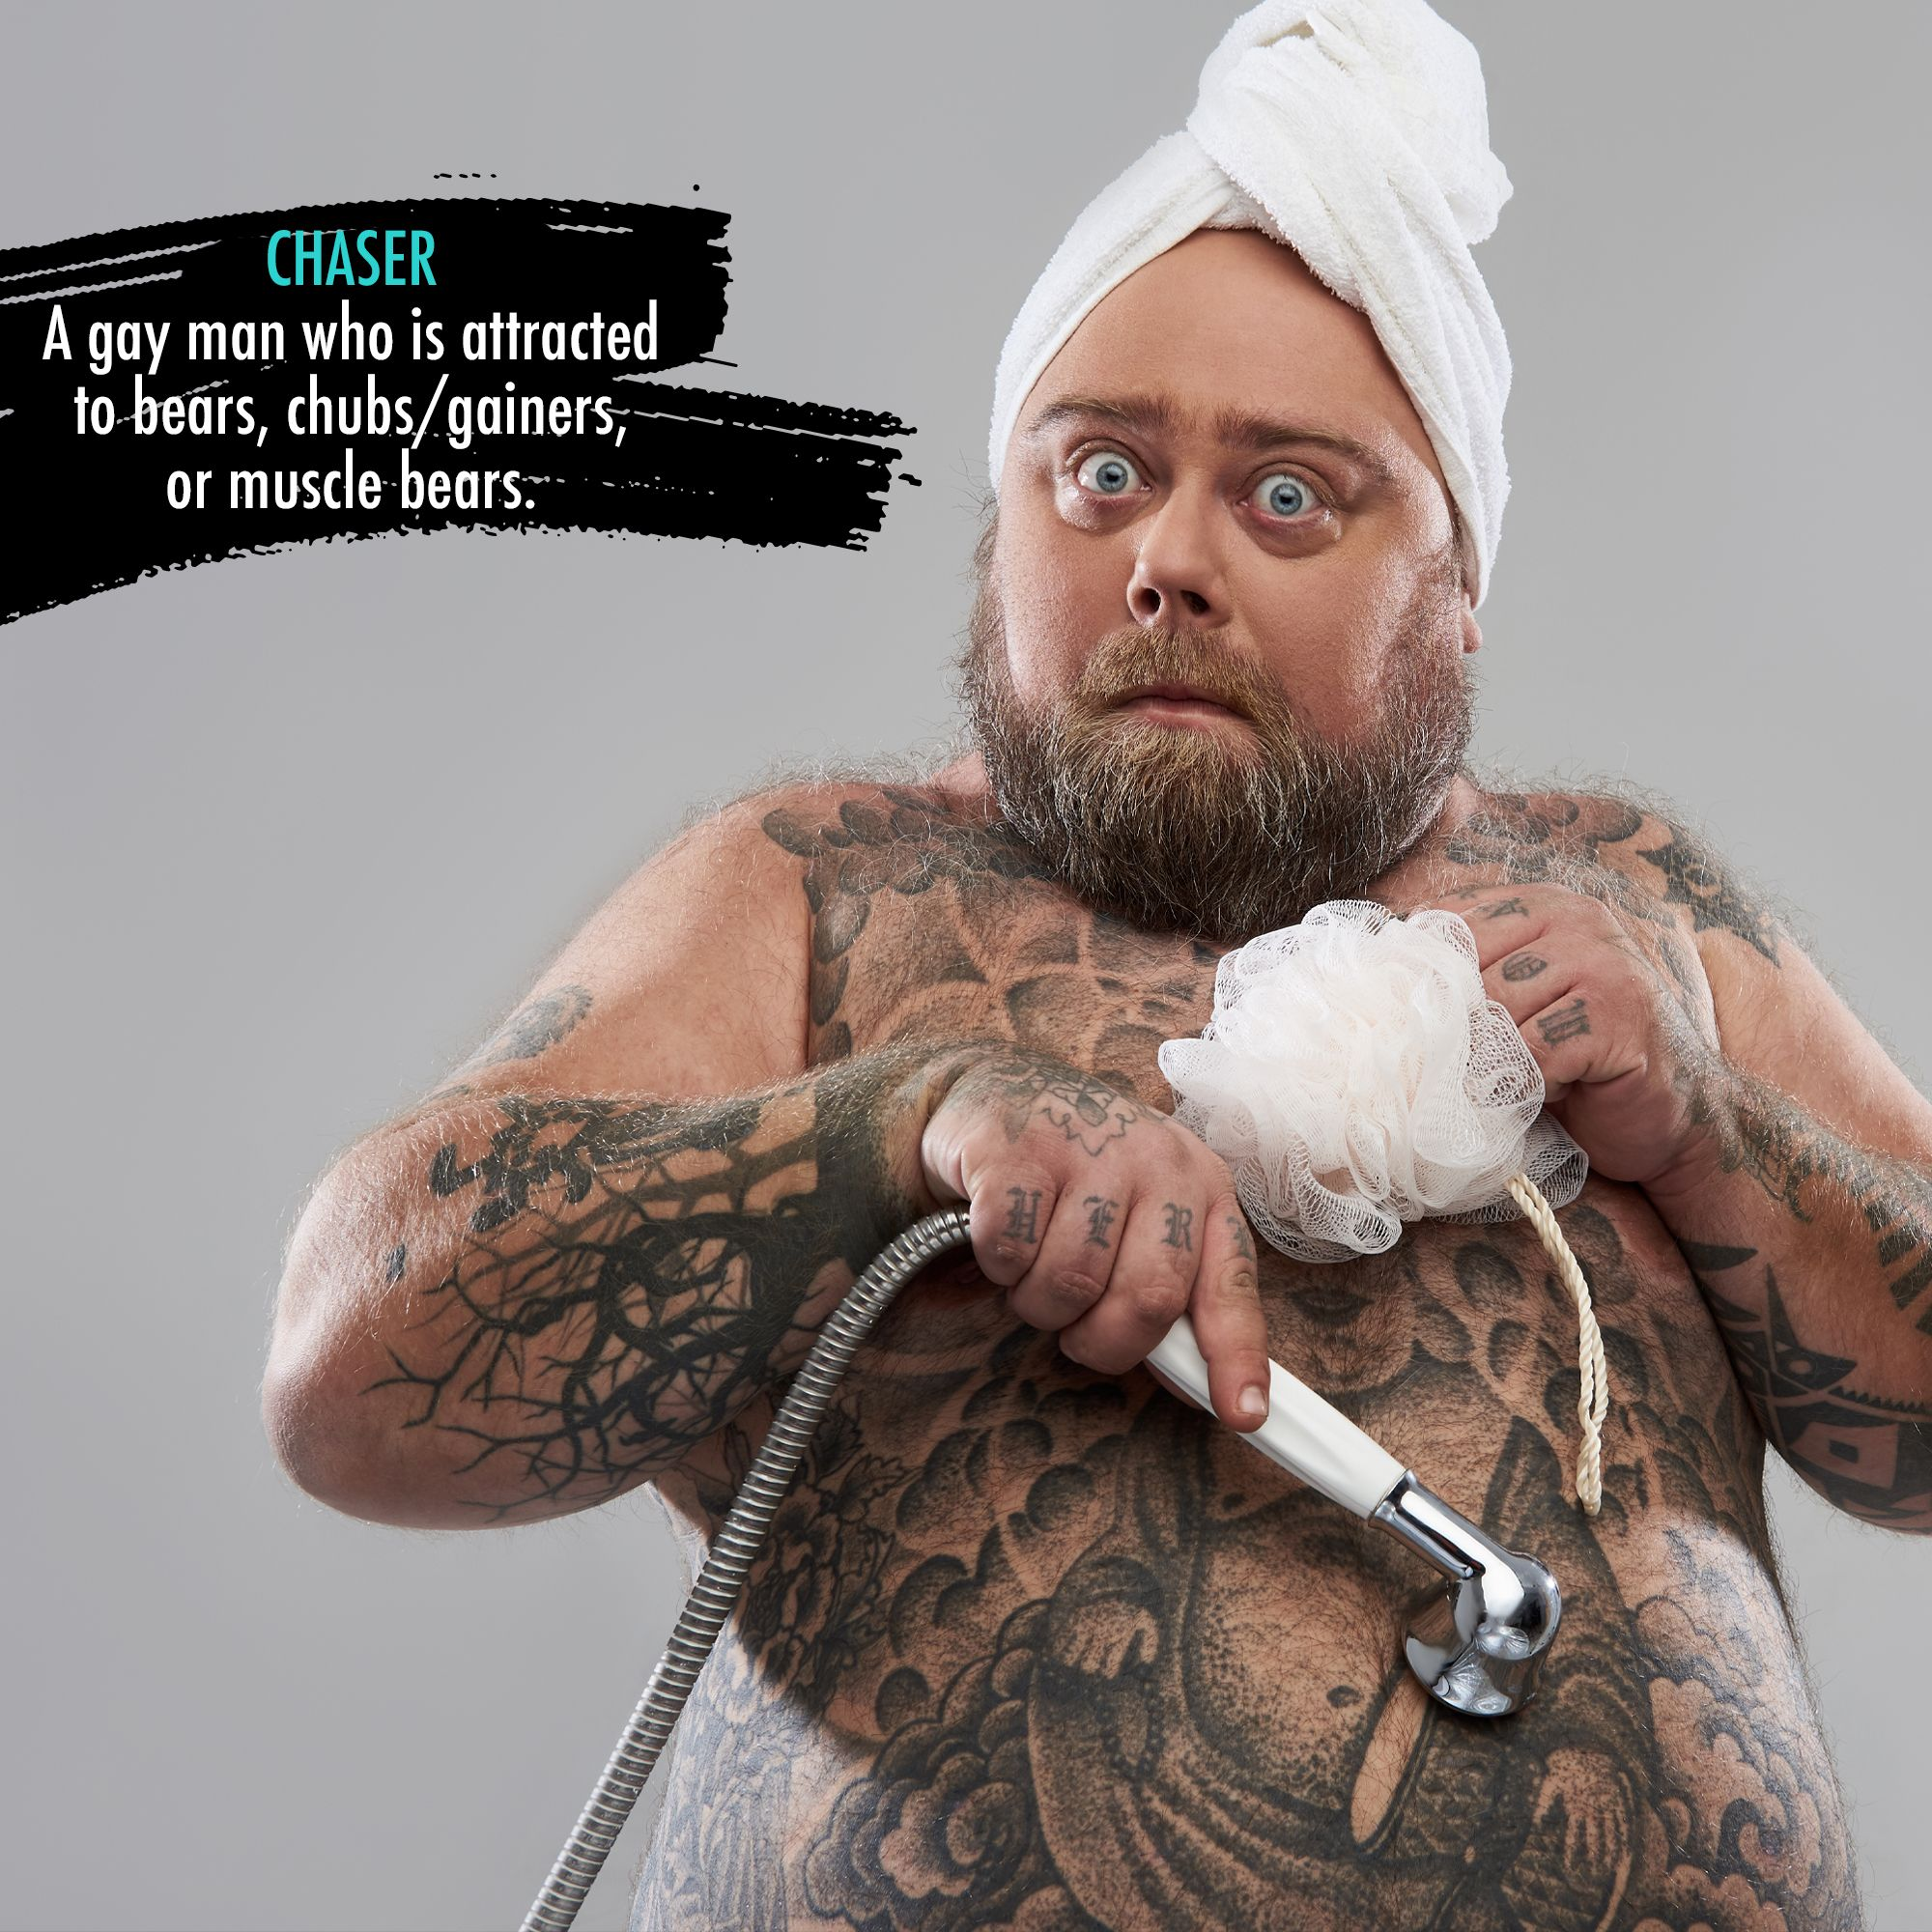 Gay slang bear